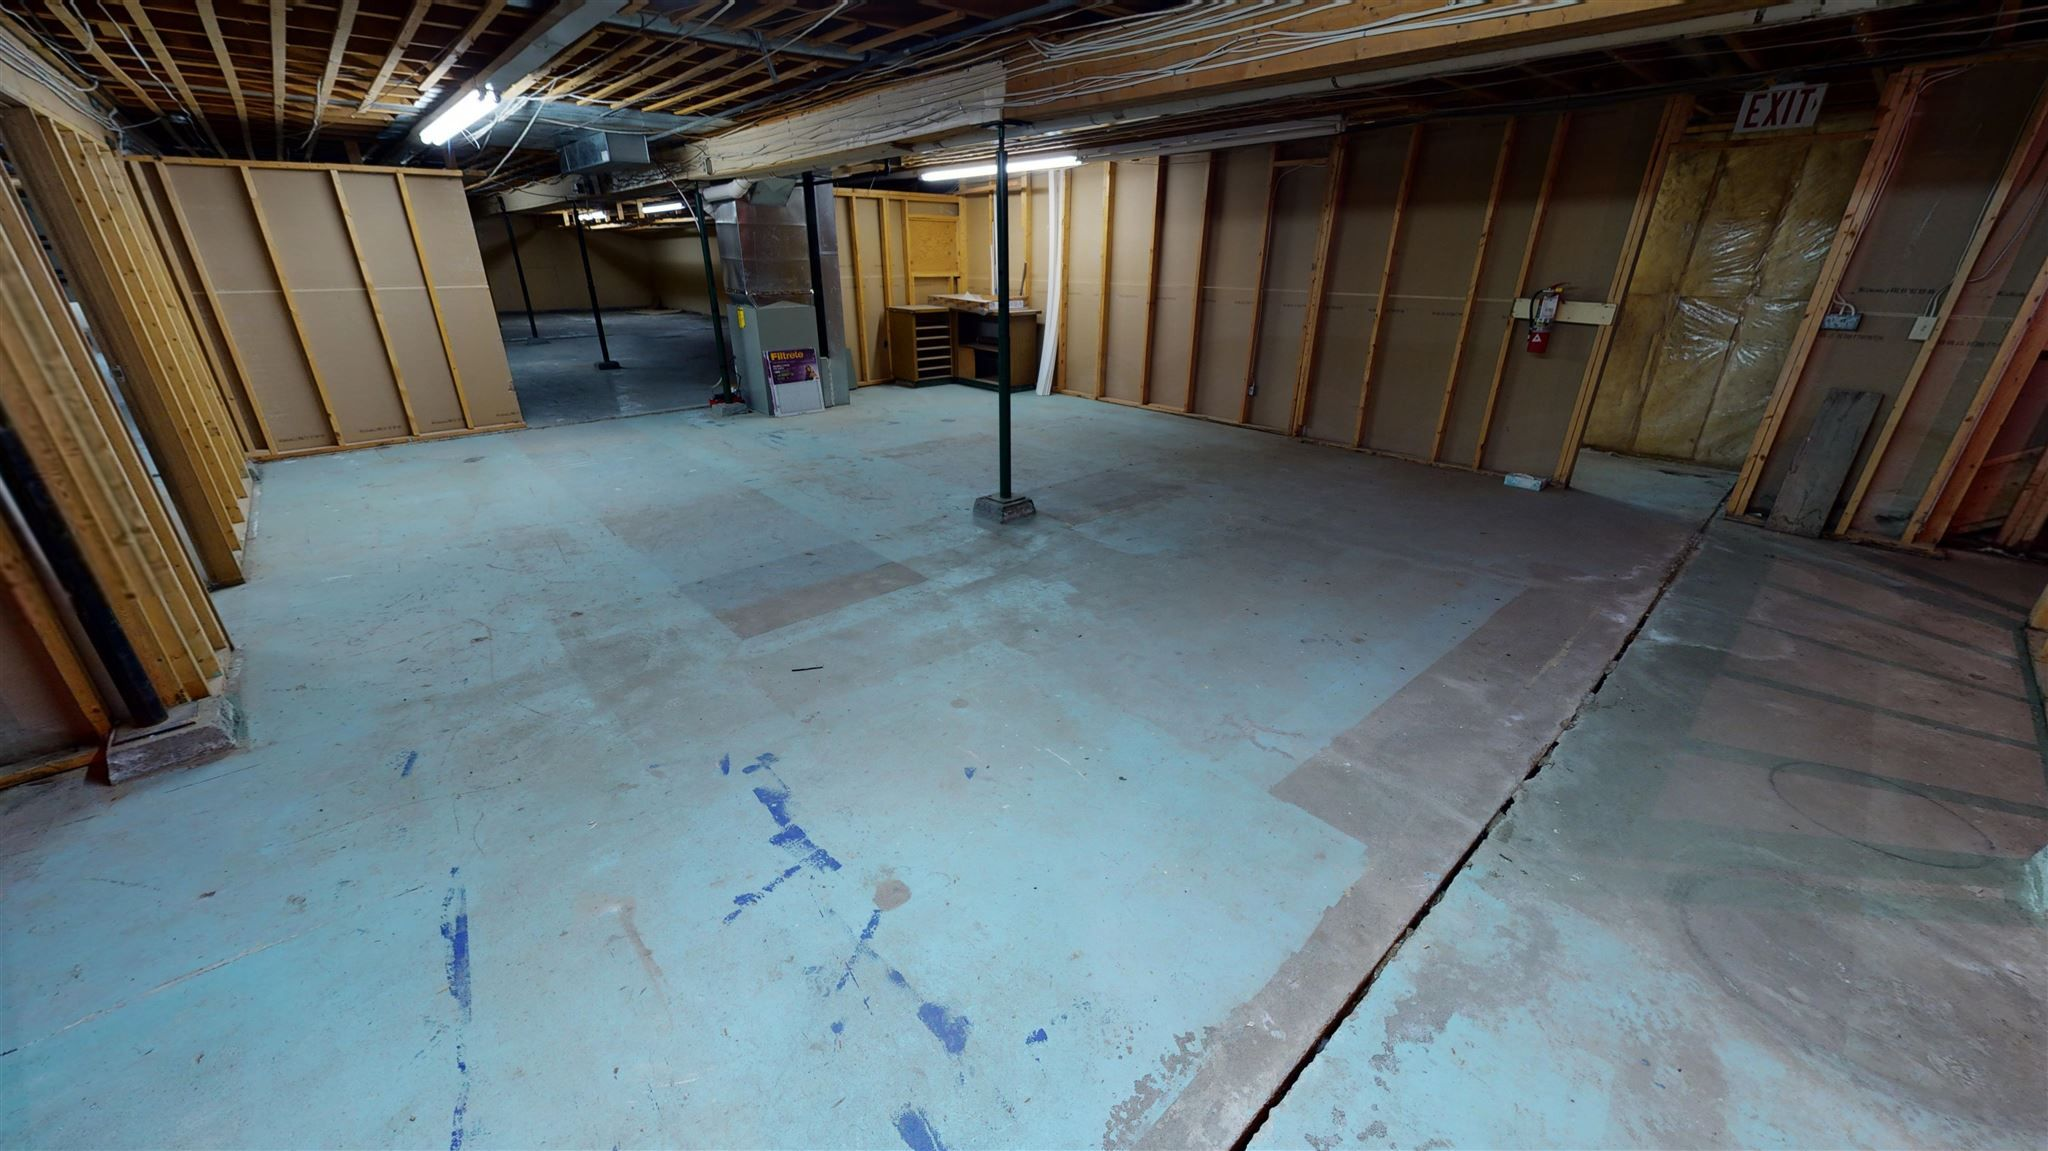 Photo 30: Photos: 10067 100 Avenue in Fort St. John: Fort St. John - City NW Office for sale (Fort St. John (Zone 60))  : MLS®# C8039097